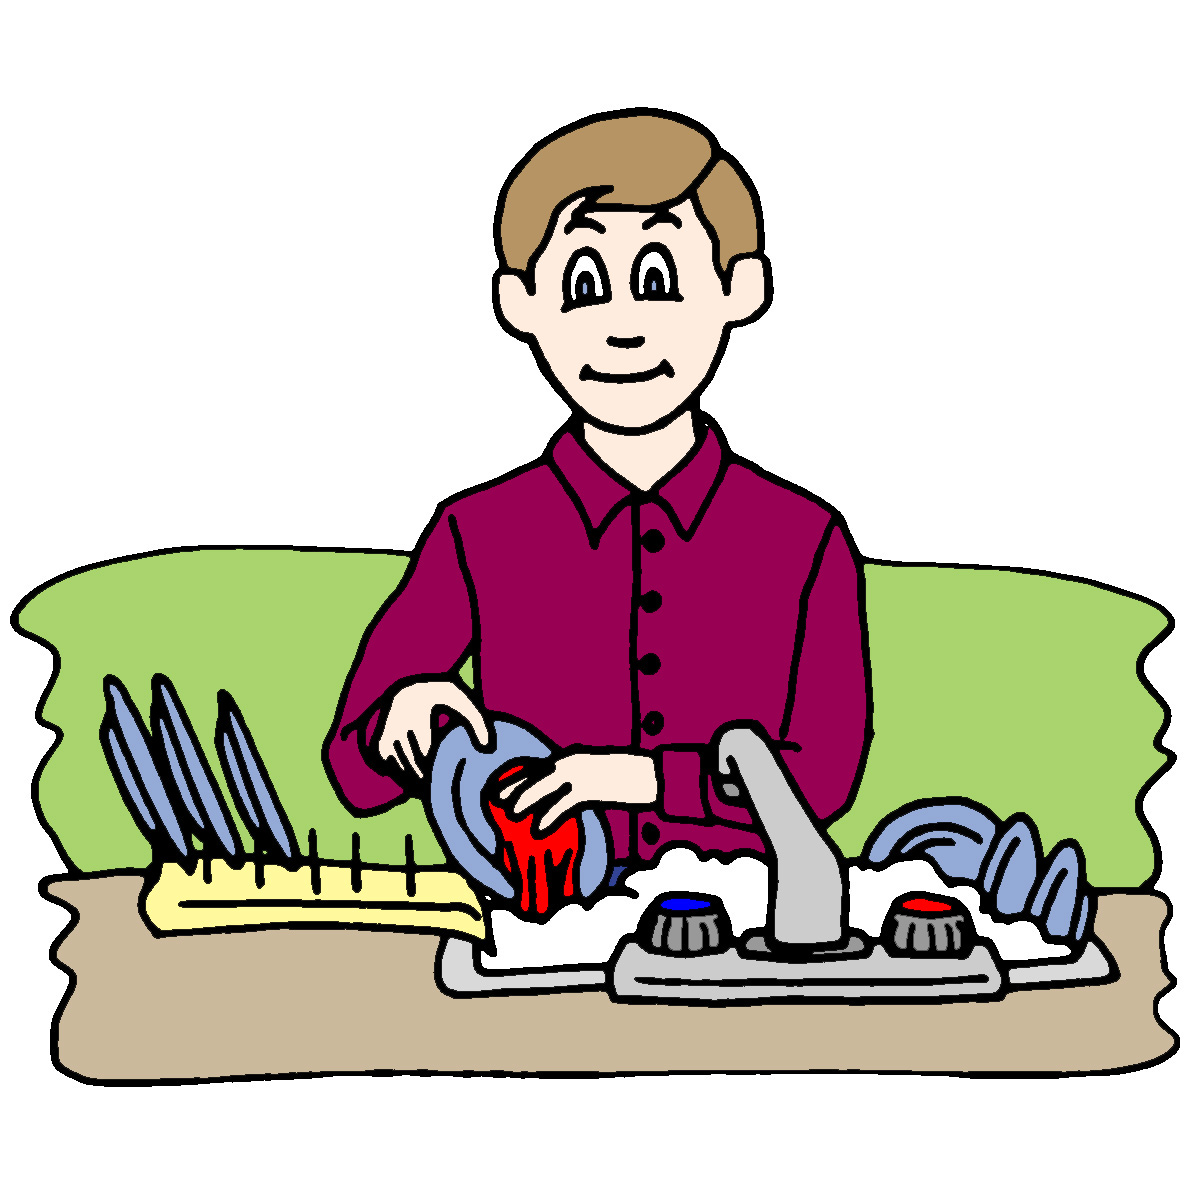 Washing Dishes Clip Art N9 free image.